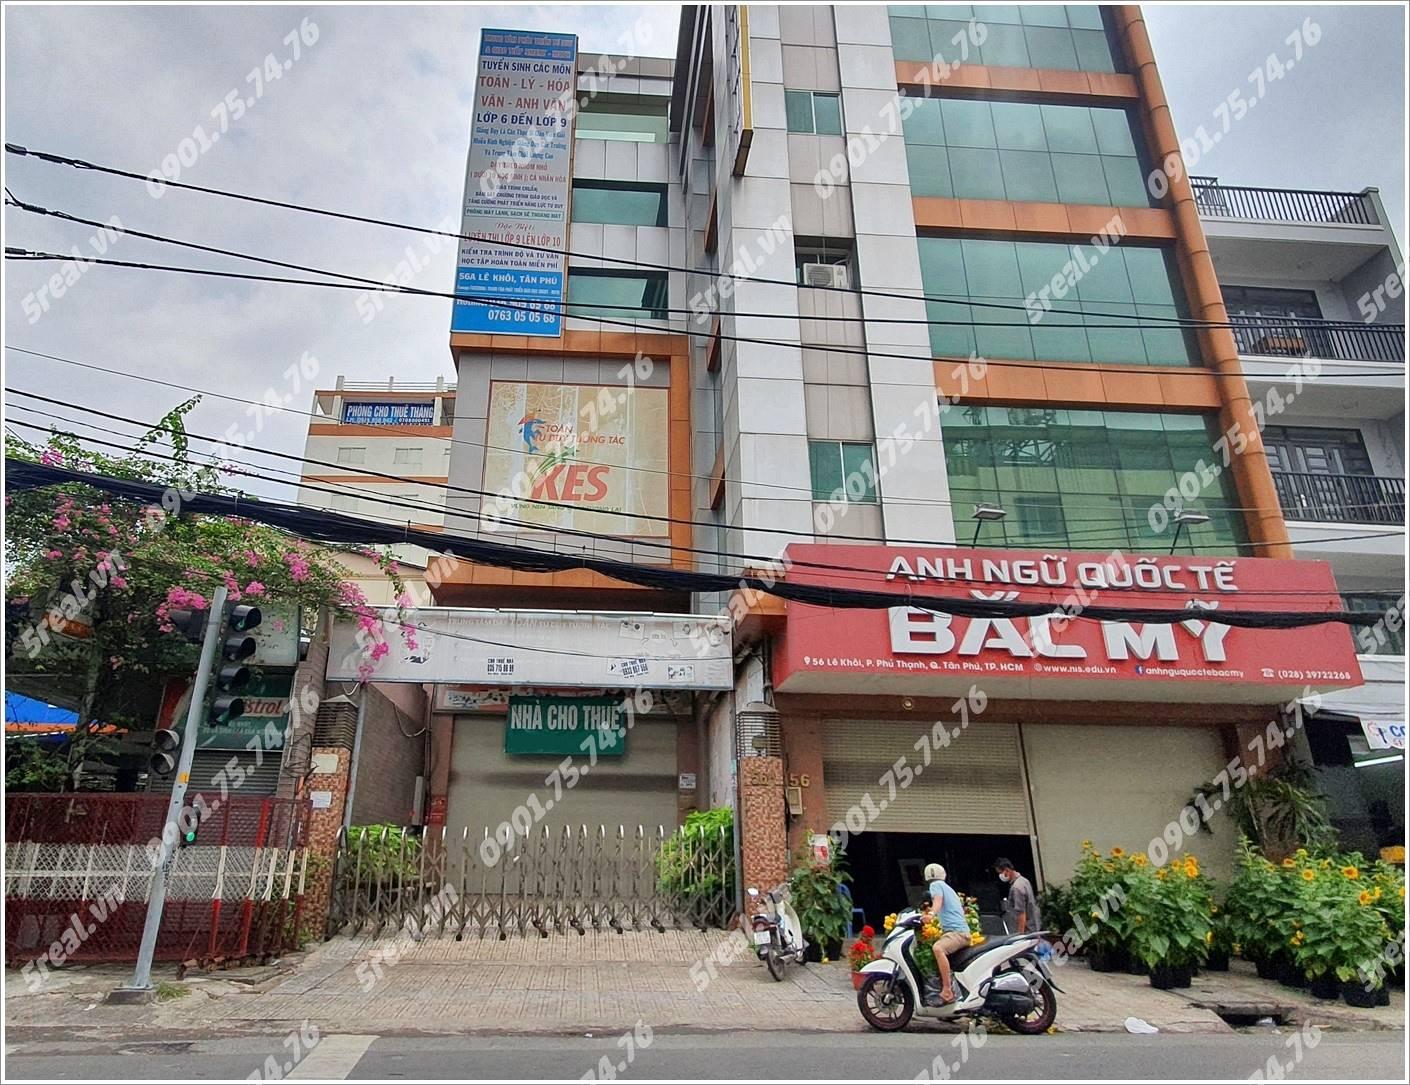 kes-building-le-khoi-quan-tan-phu-van-phong-cho-thue-tphcm-5real.vn-01